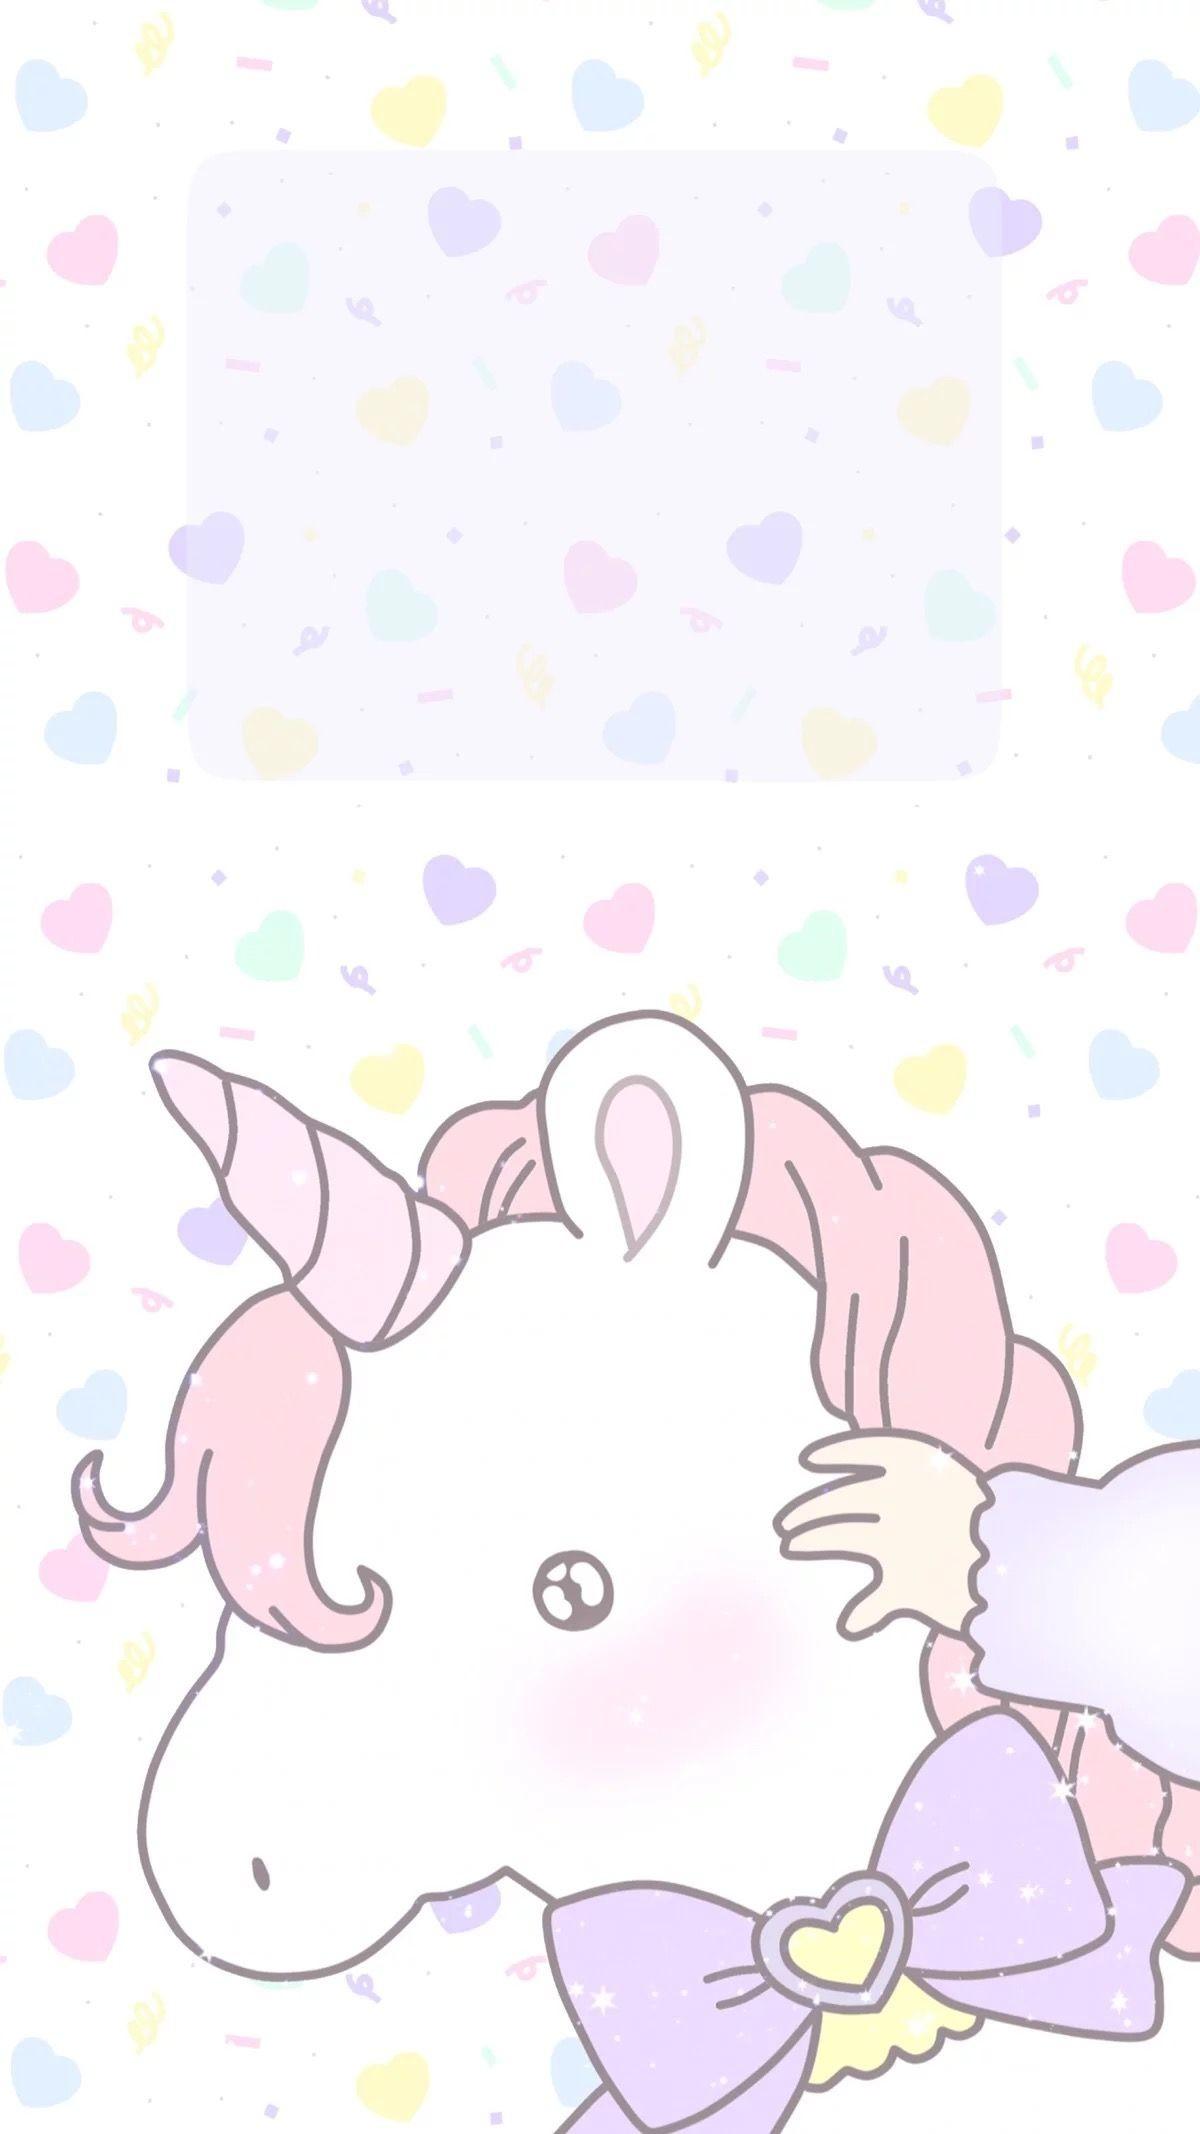 Res: 1200x2134, Star Wallpaper, Kawaii Wallpaper, Wallpaper Backgrounds, Rilakkuma, Pony,  Screens, Twin, Unicorns, Wallpapers